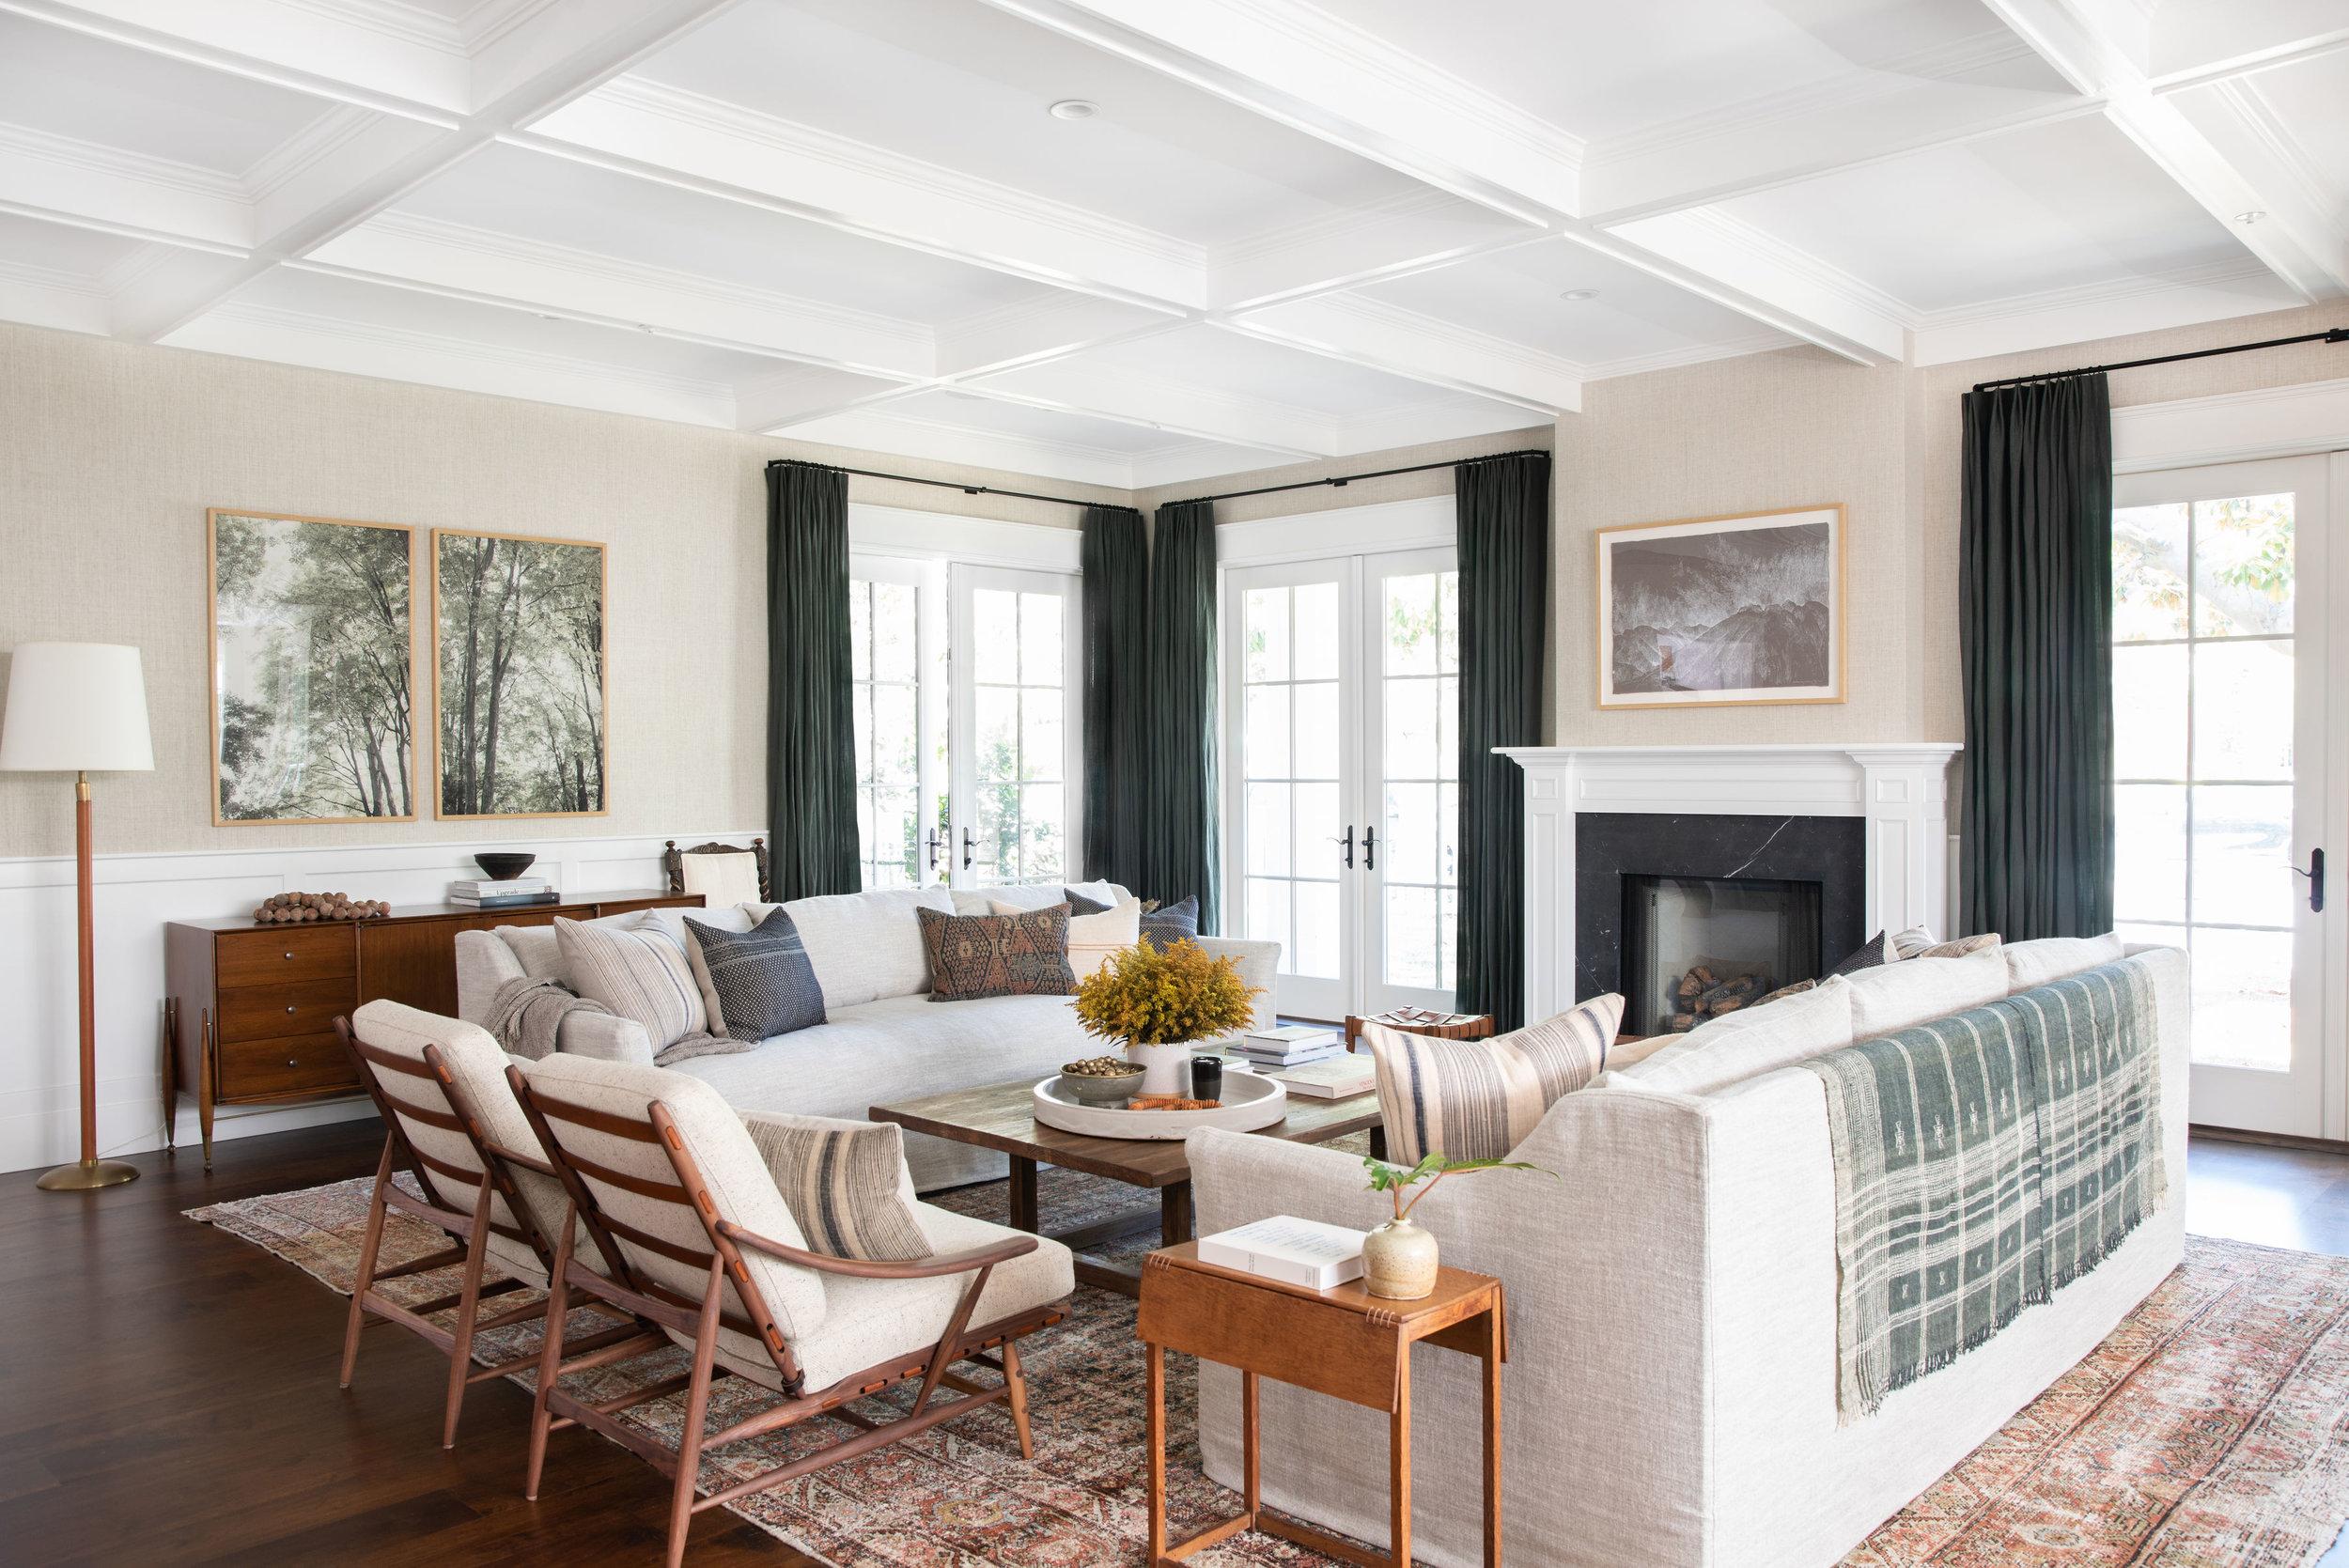 Tessa Neustadt for Amber Interiors